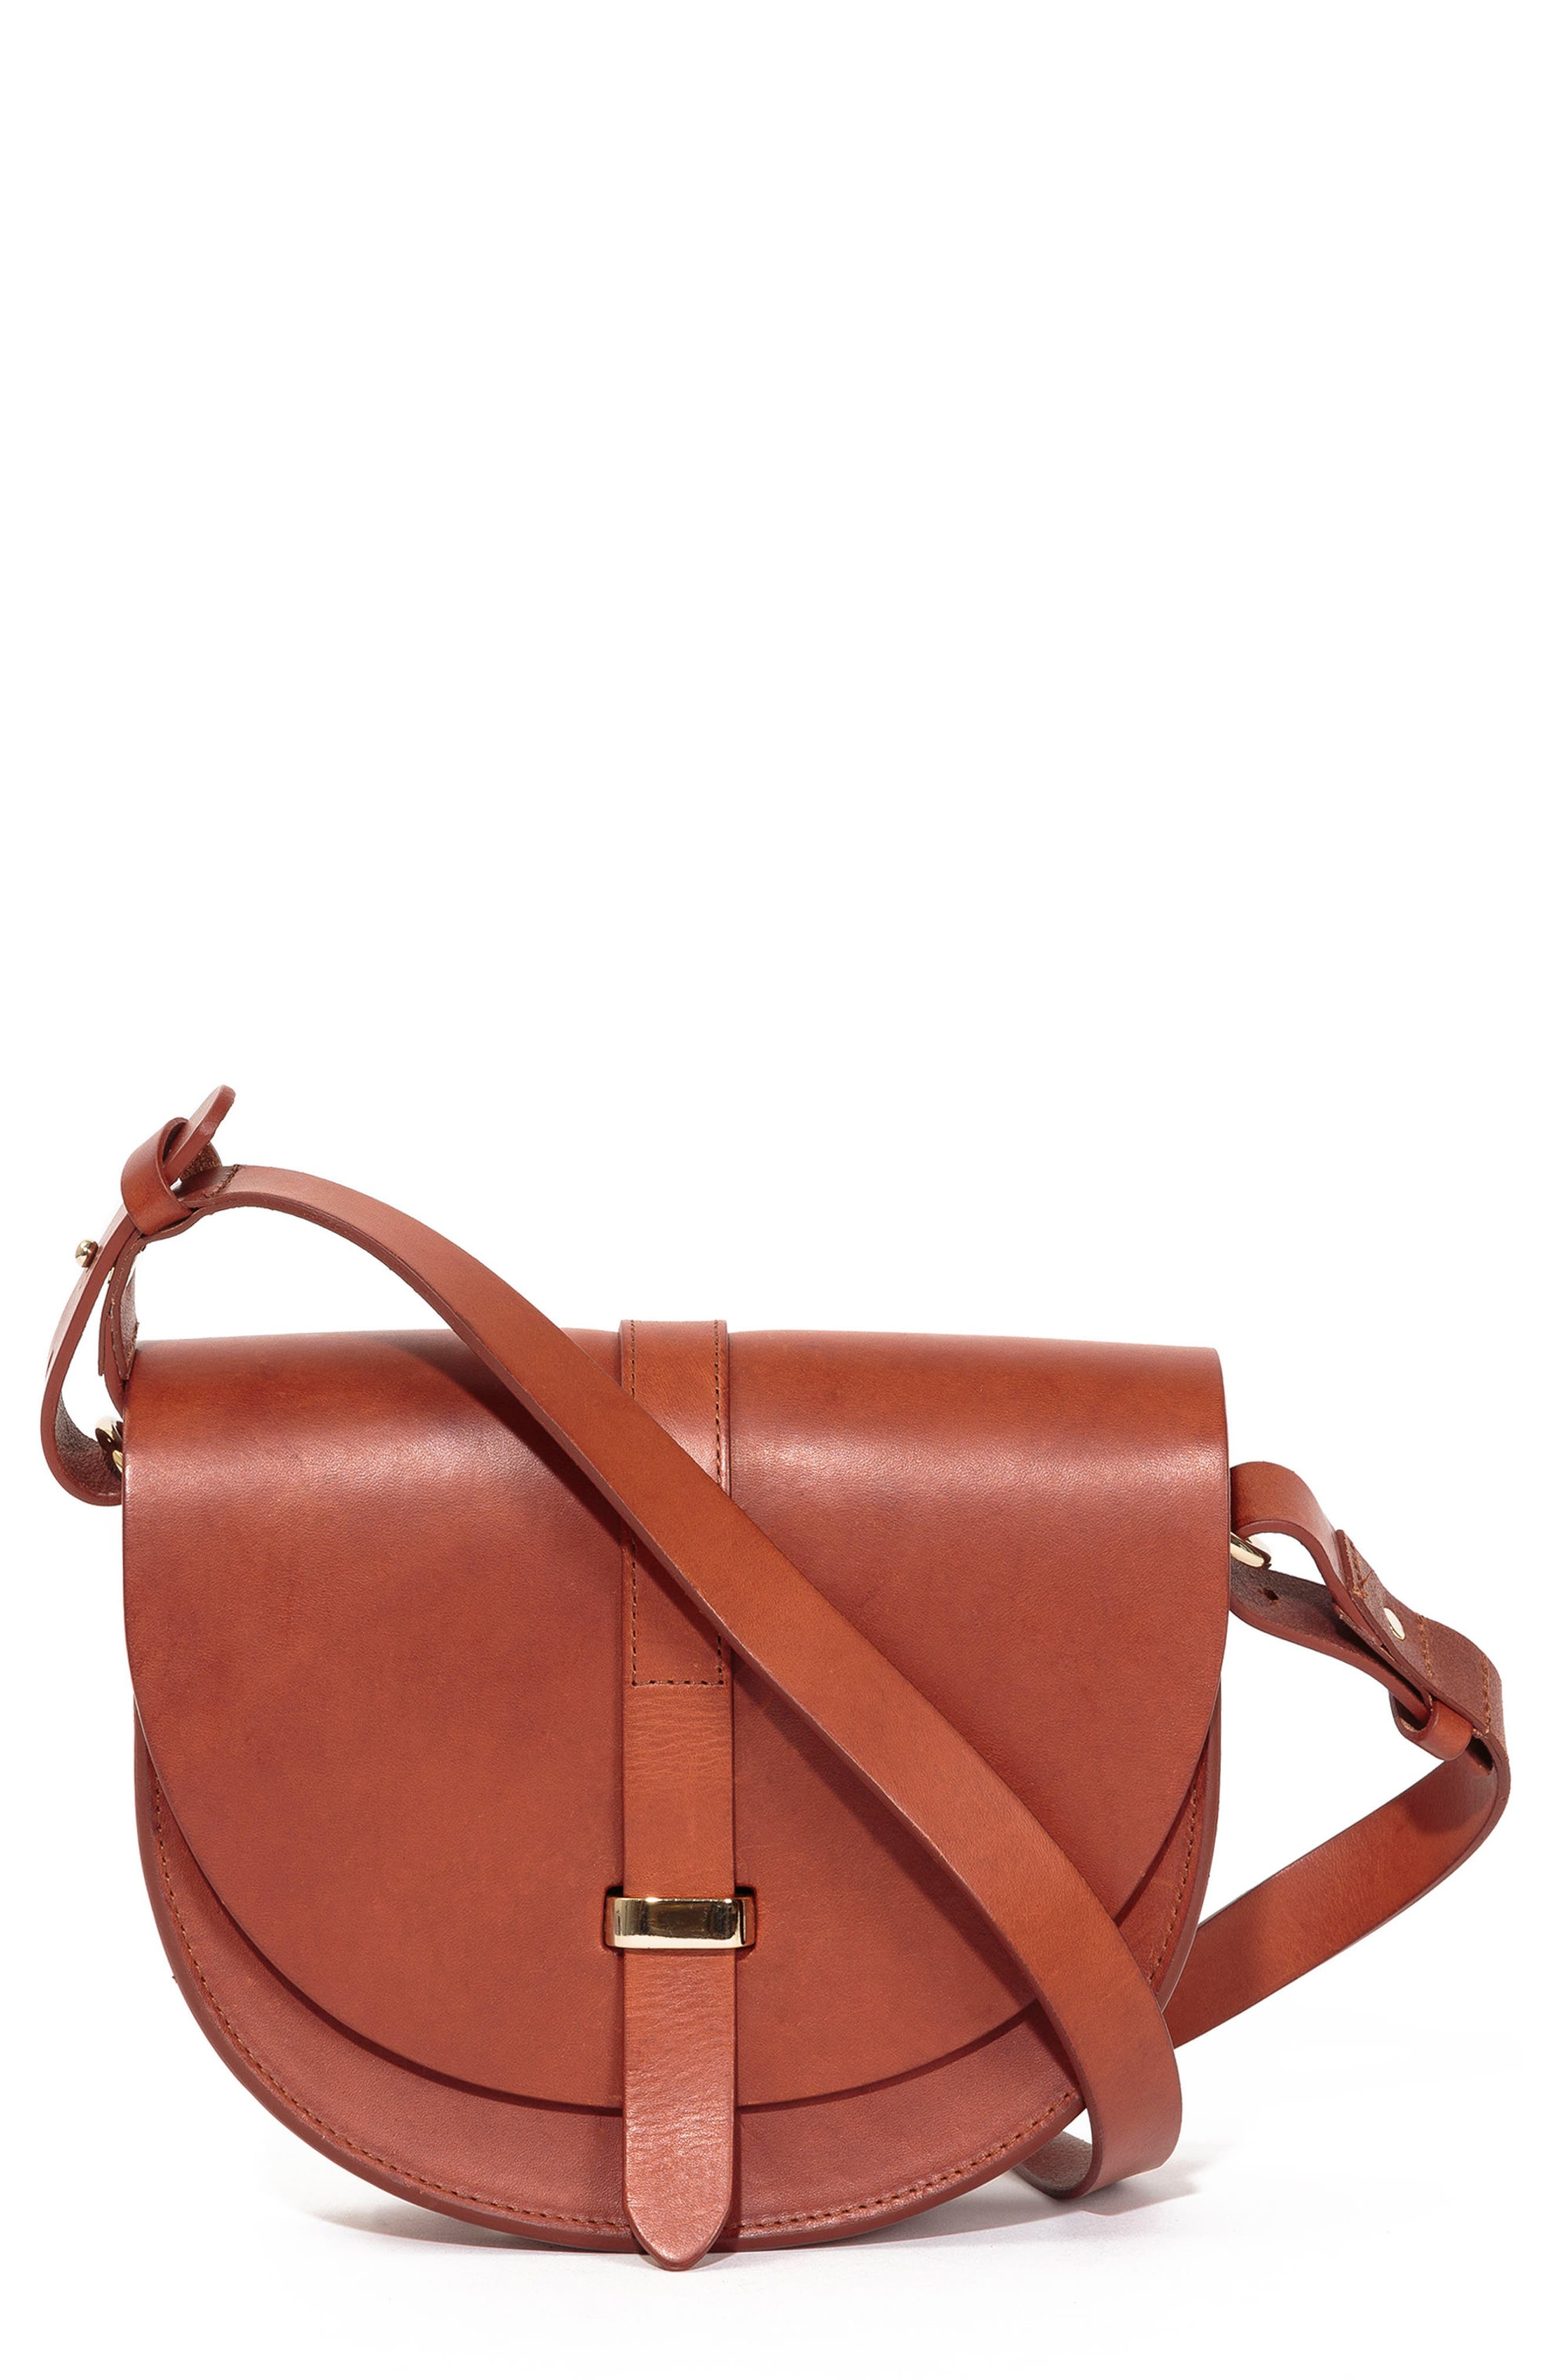 Claude Crossbody Bag,                         Main,                         color, Chocolate